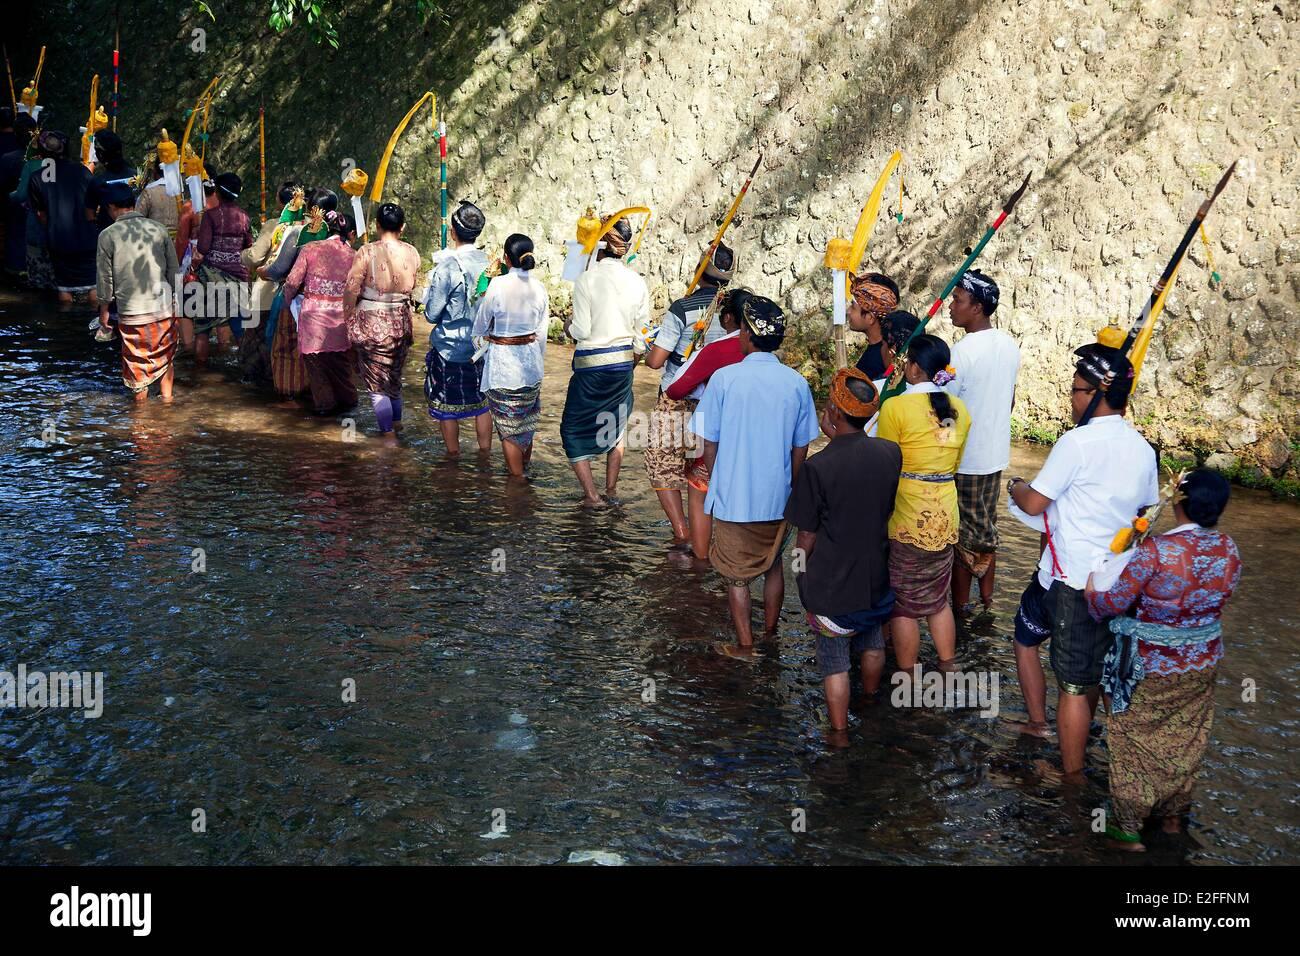 Indonesia, Bali, near Ubud, Tampaksiring, traditional festival - Stock Image